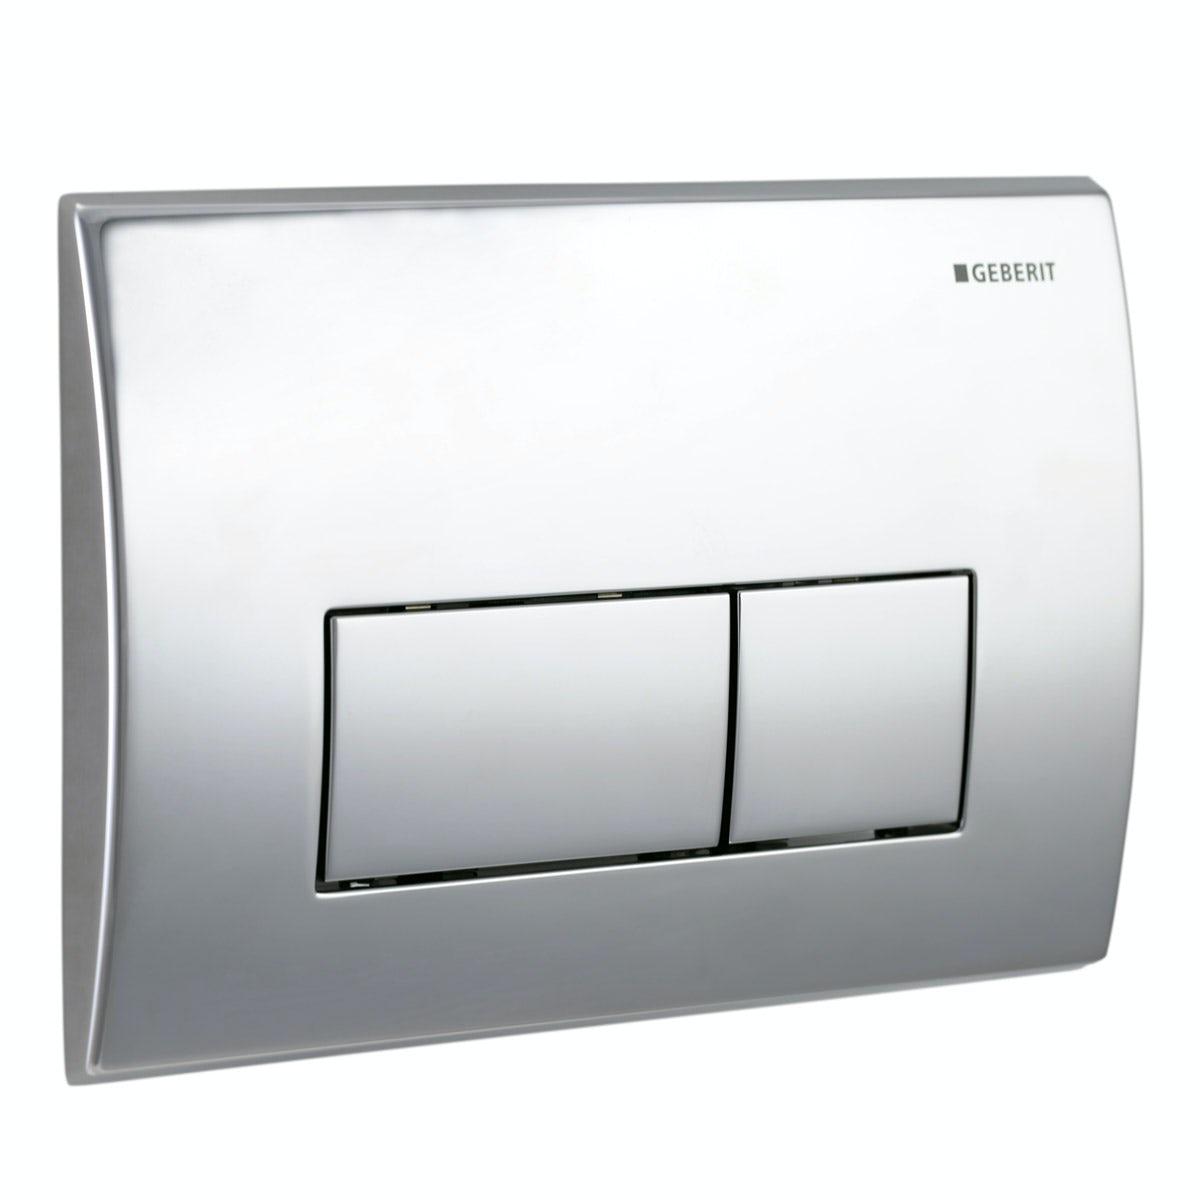 Geberit Kappa50 dual flush plate gloss chrome